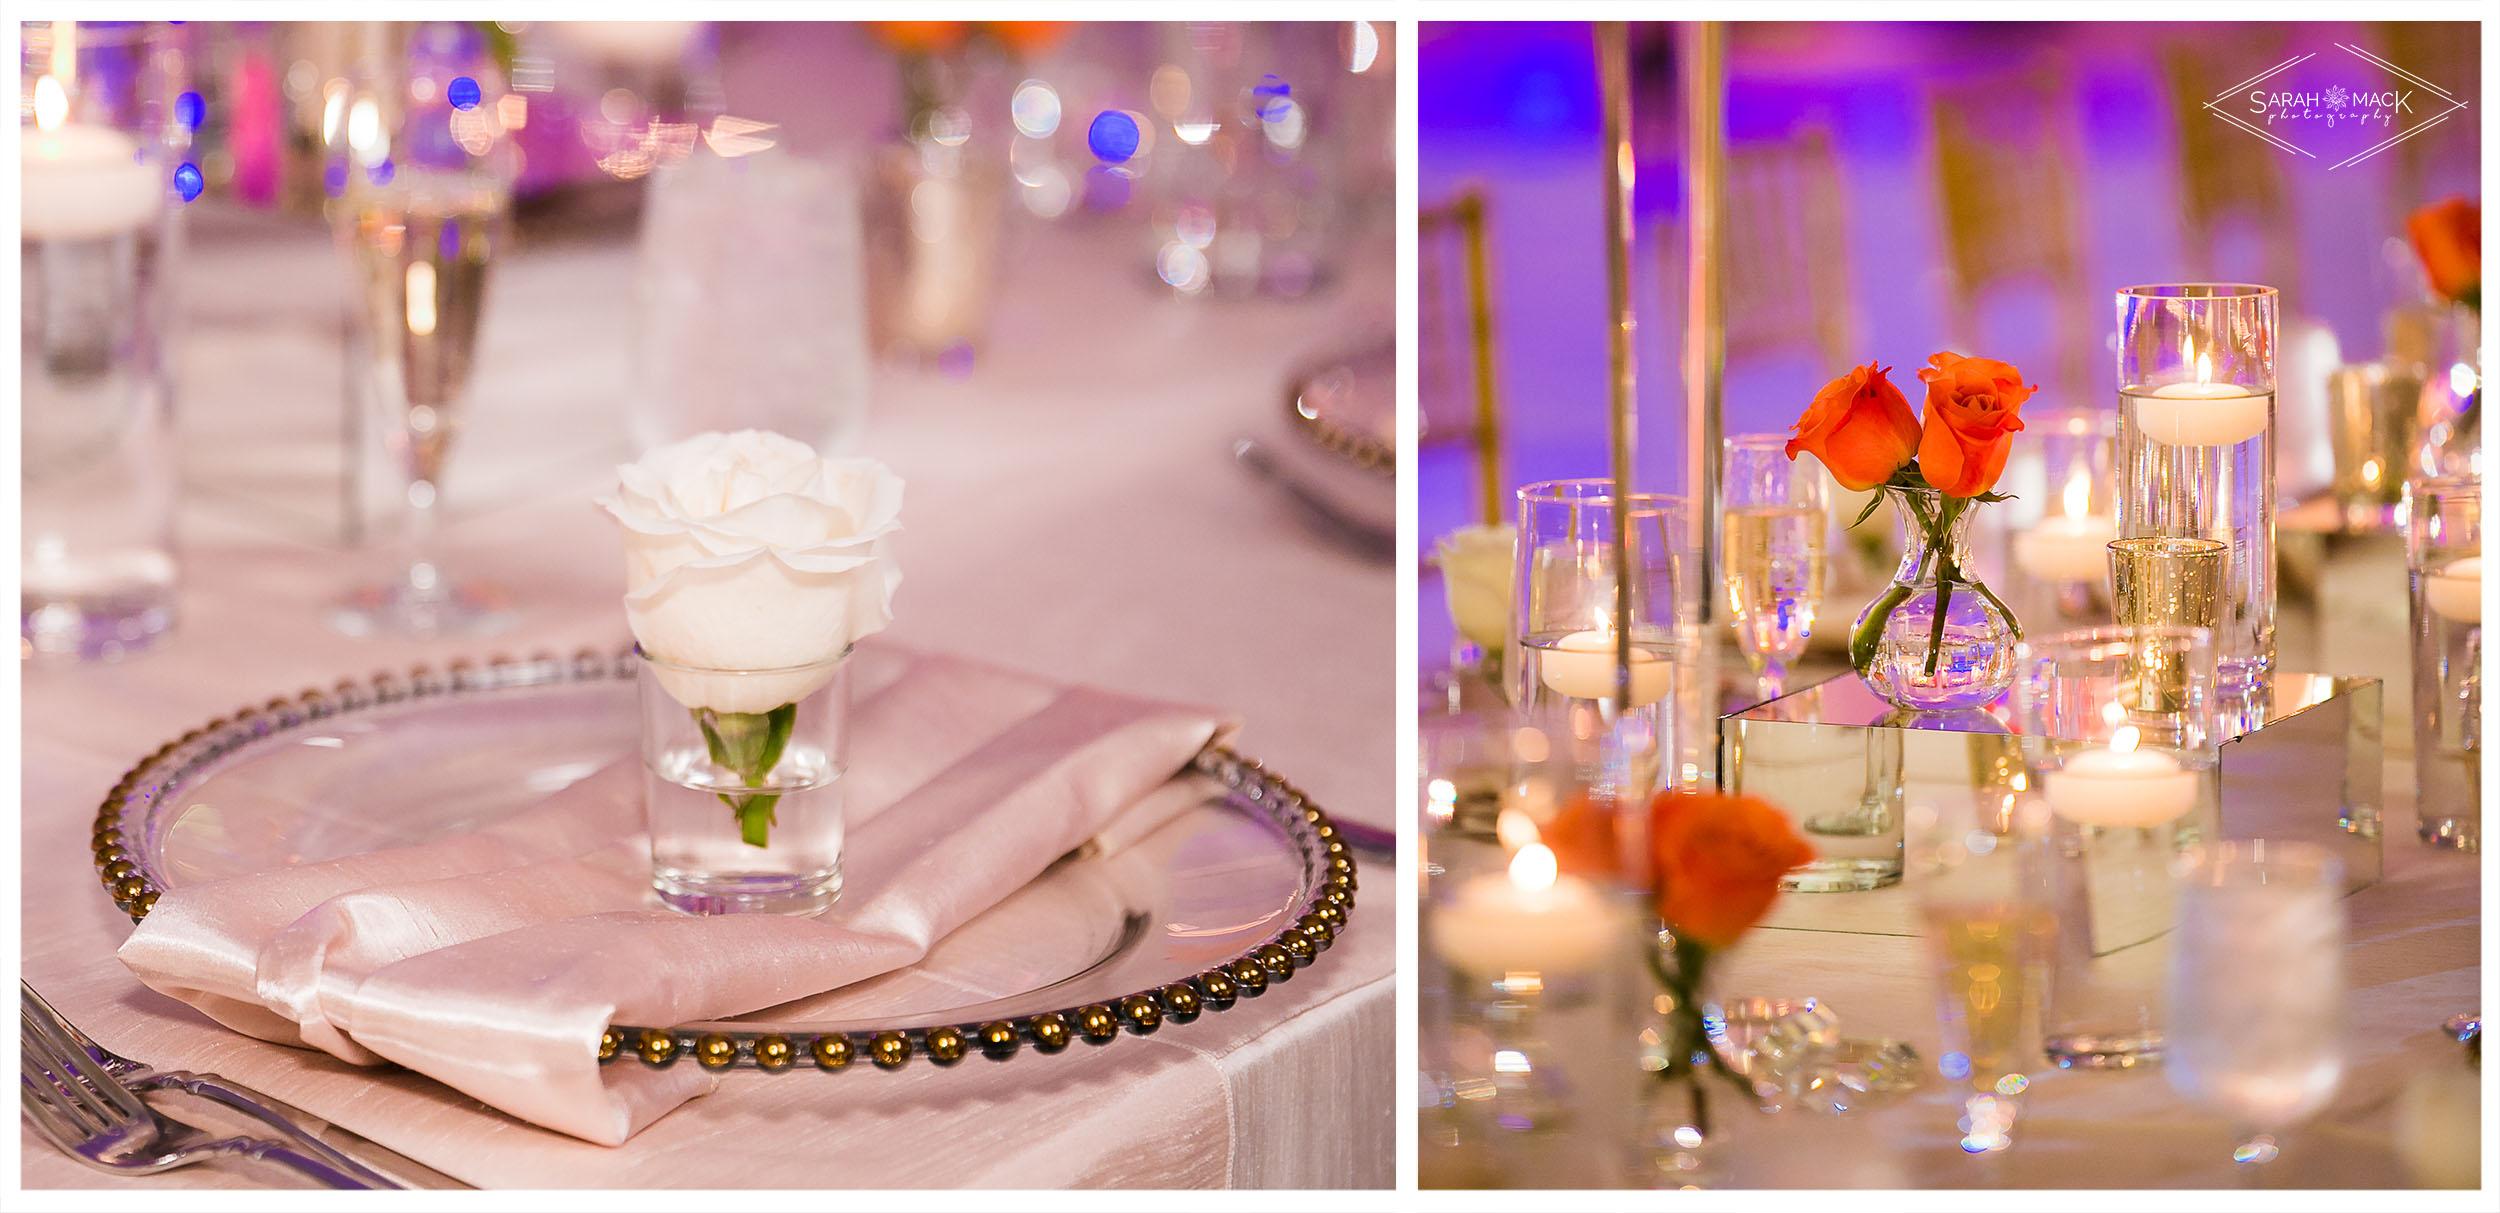 NJ-Newport-Beach-Marriott-Persian-Wedding-37.jpg